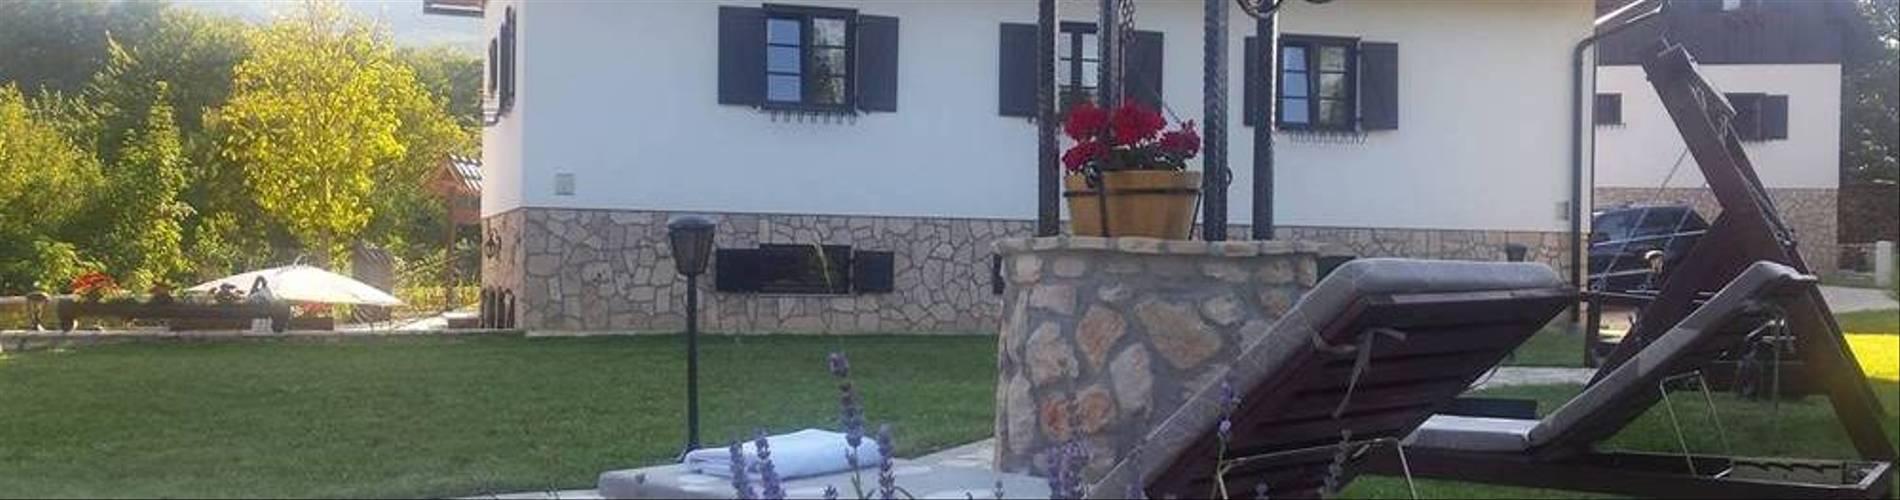 Etno-Garden-Plitvice-Lakes-Accomodation-22.jpg